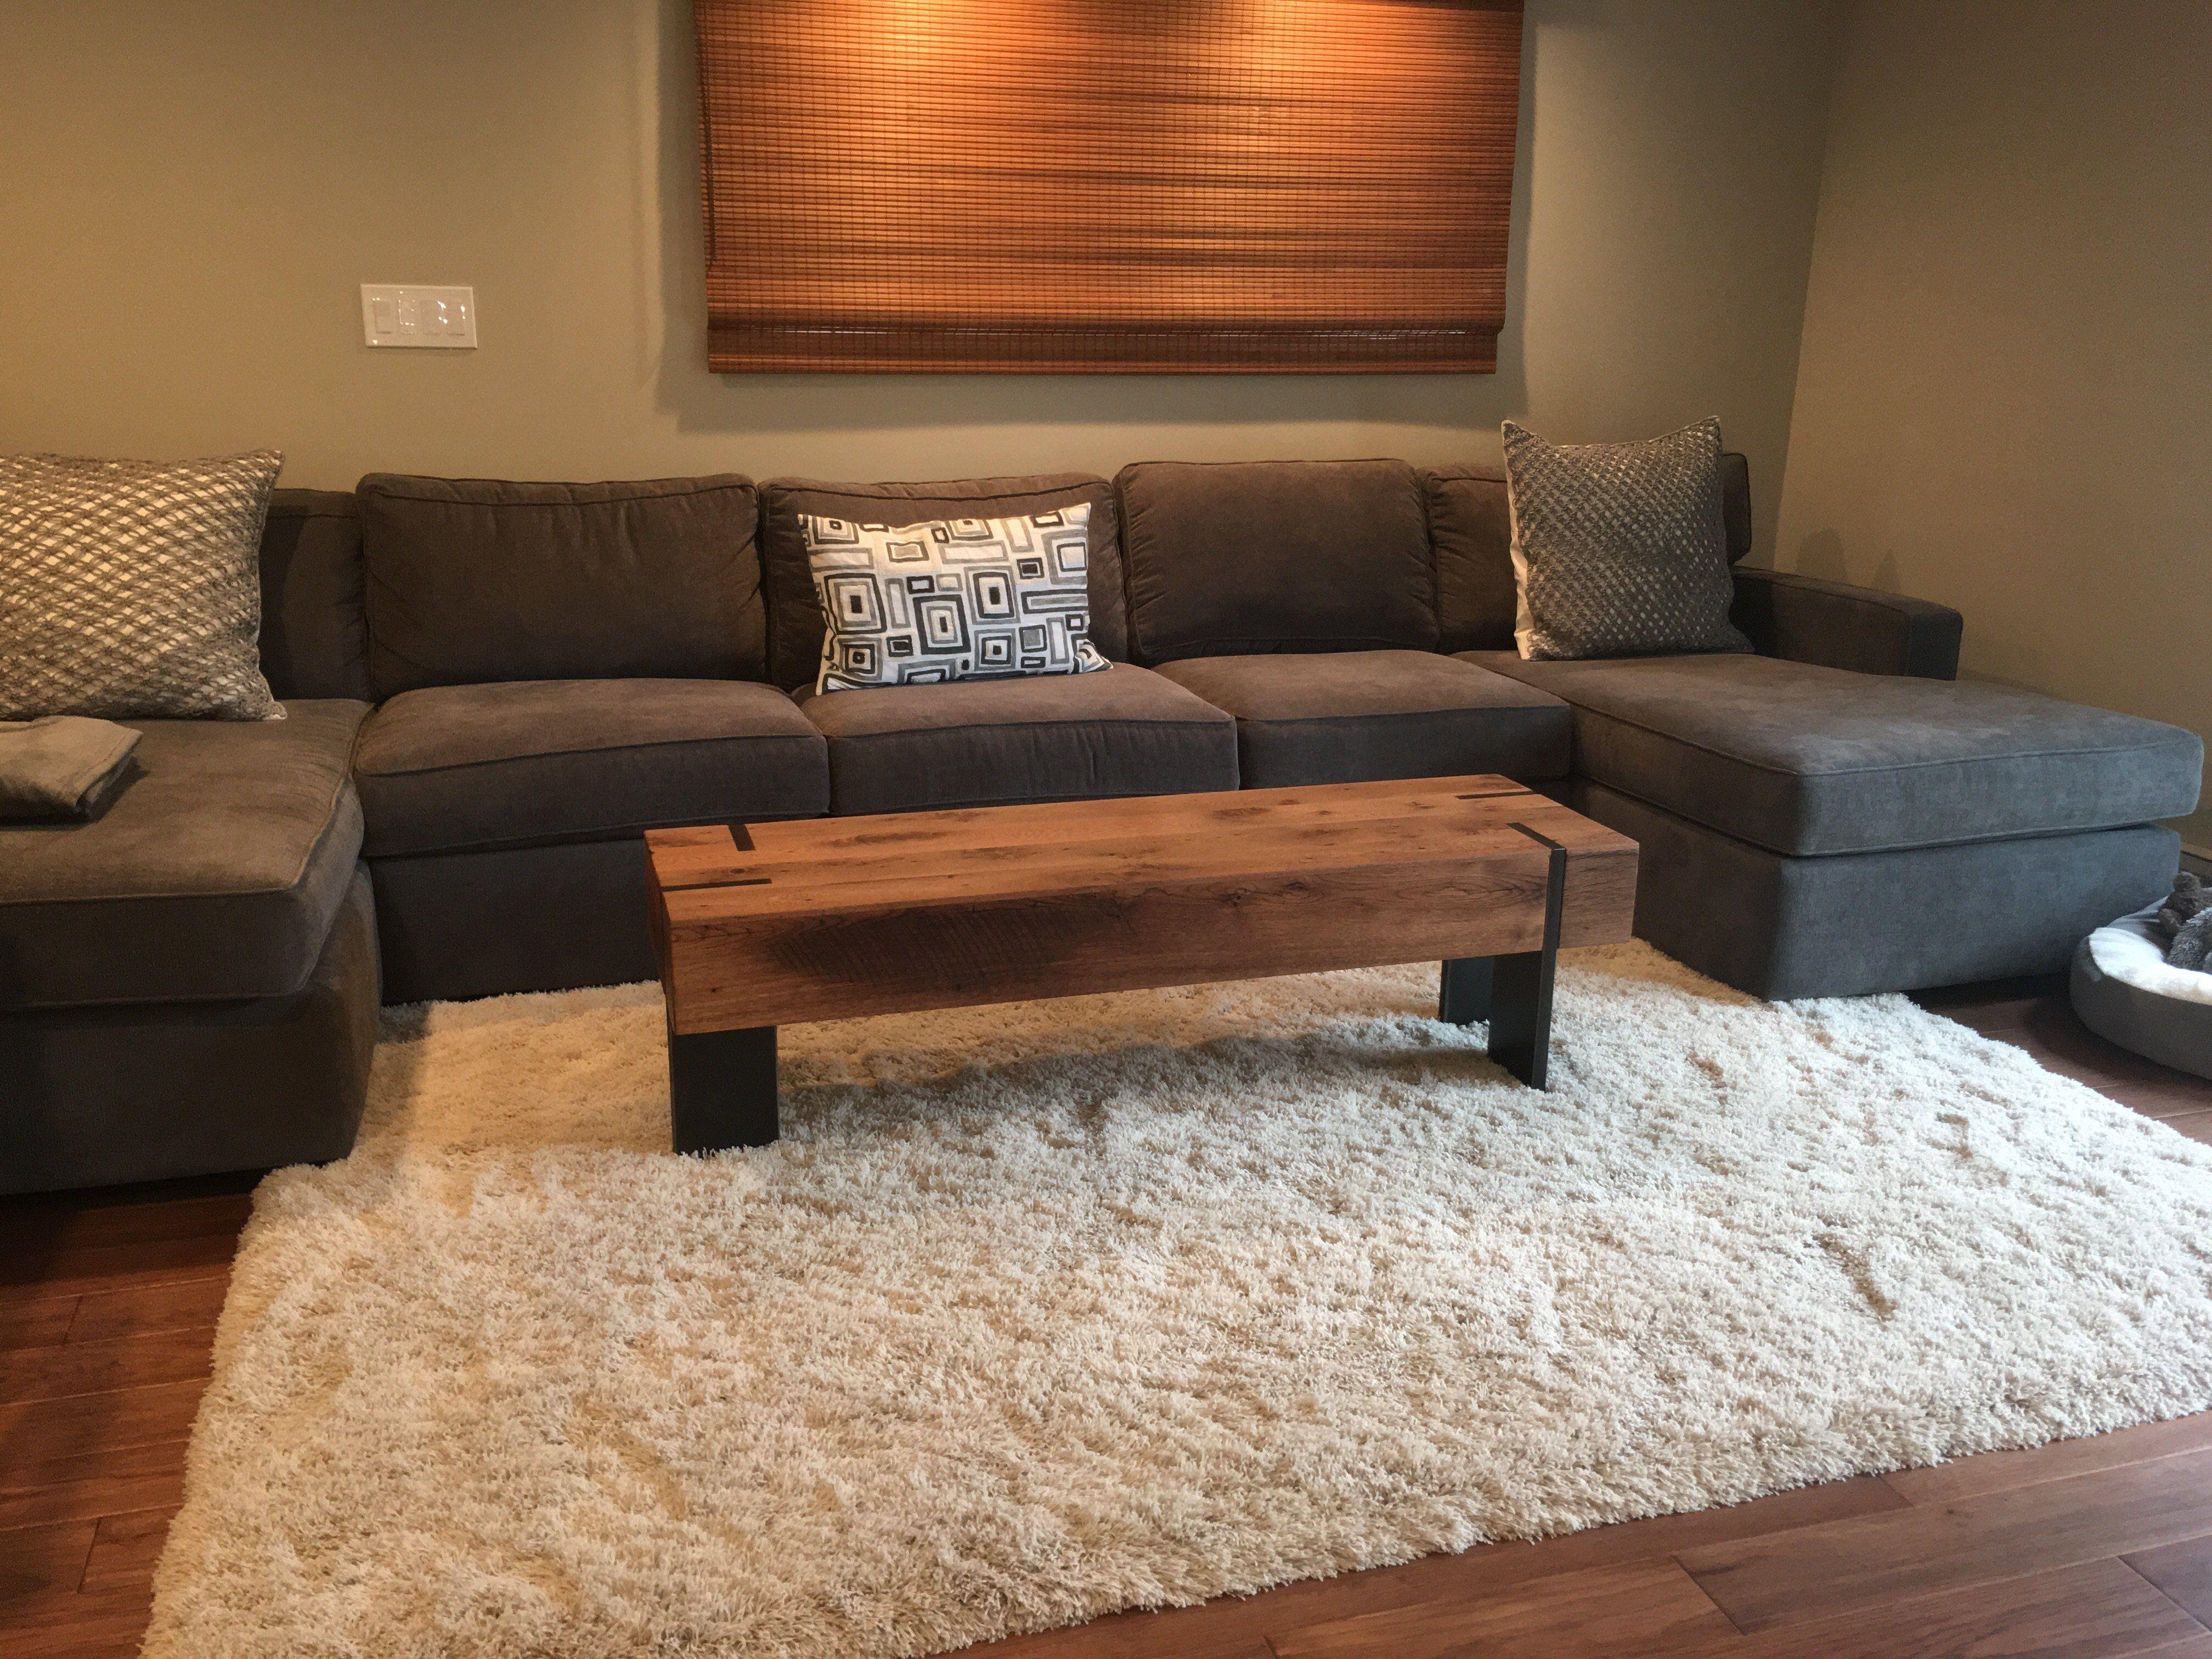 Long Rectangle Modern Reclaimed Wood Coffee Table Solid Steel Legs Reclaimed Wood Coffee Table Coffee Table Wood Artisan Furniture